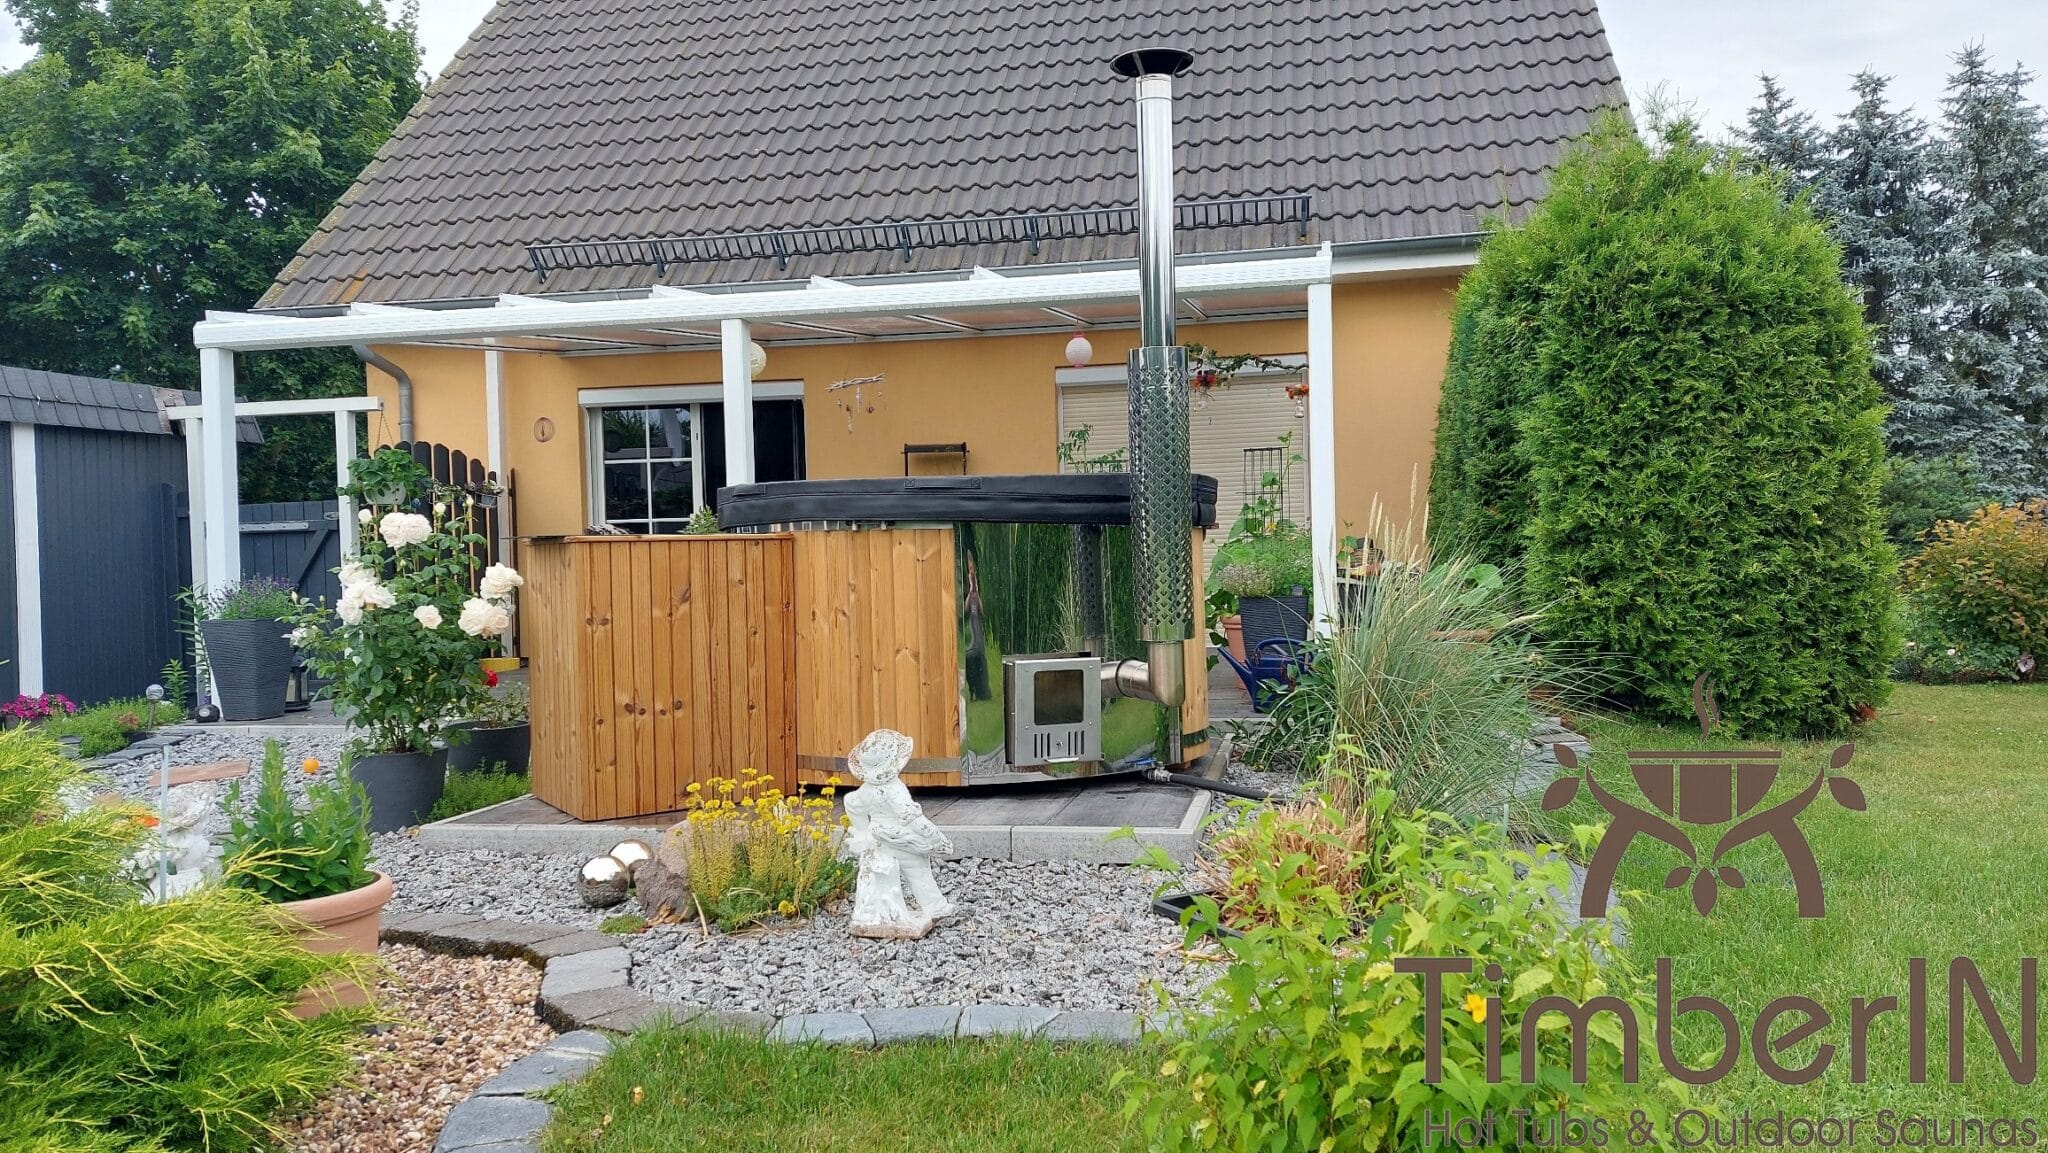 Badezuber Badefass Hot Tube mit Whirlpool Holzofen TimberIN Rojal Mario Sarmstorf Deutschland 3